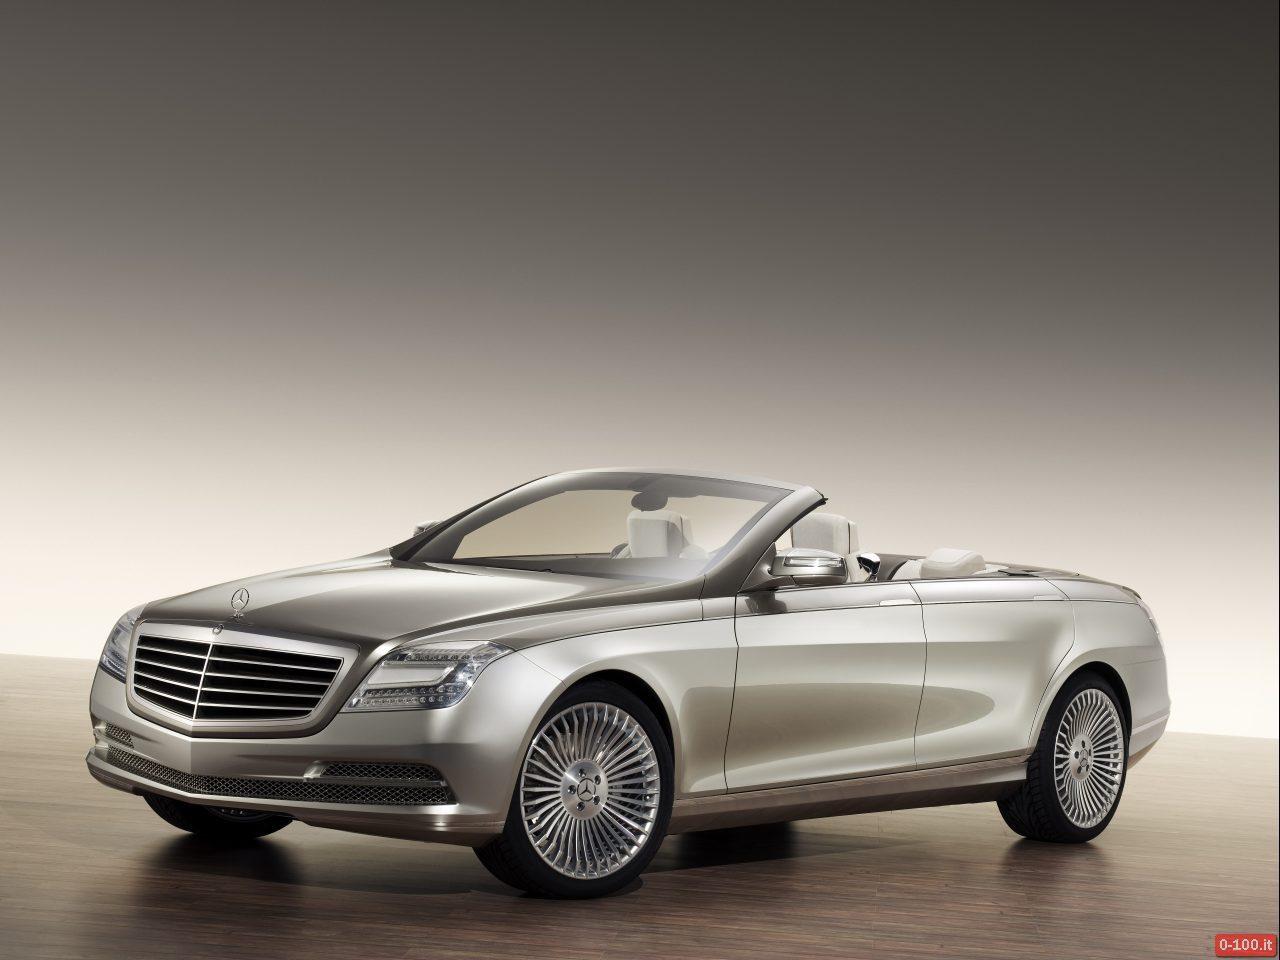 Mercedes_S_Class_Convertible_Ocean_Drive_Concept-0-100_1